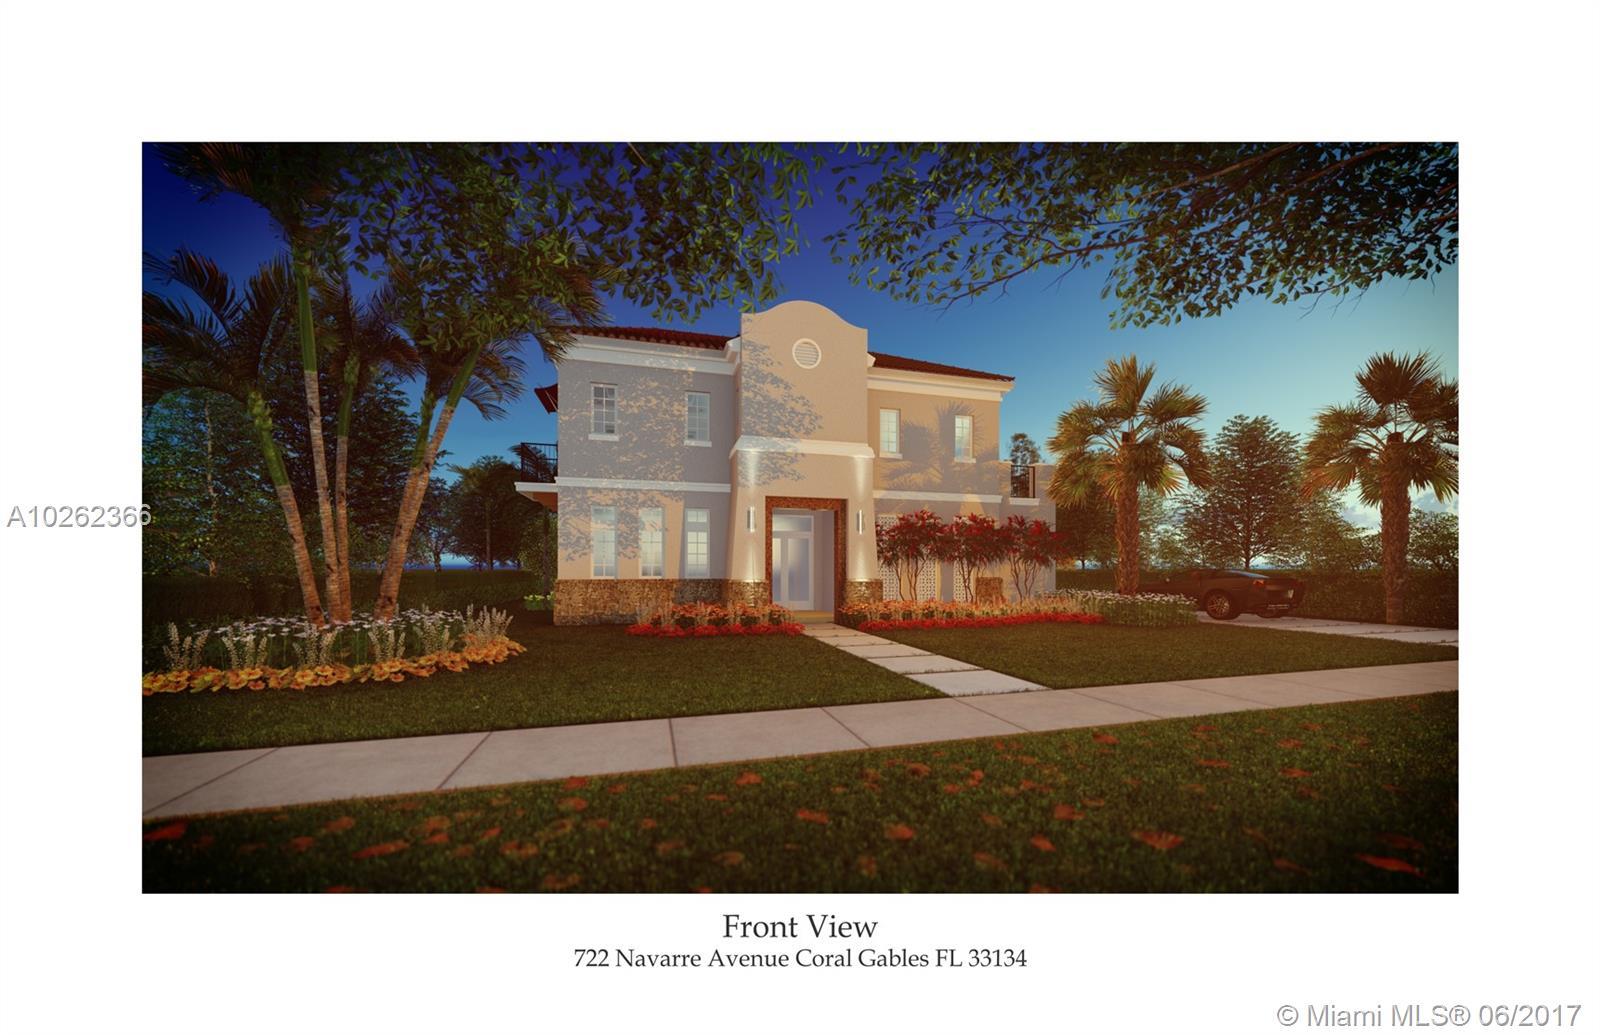 722 Navarre Ave - Coral Gables, Florida